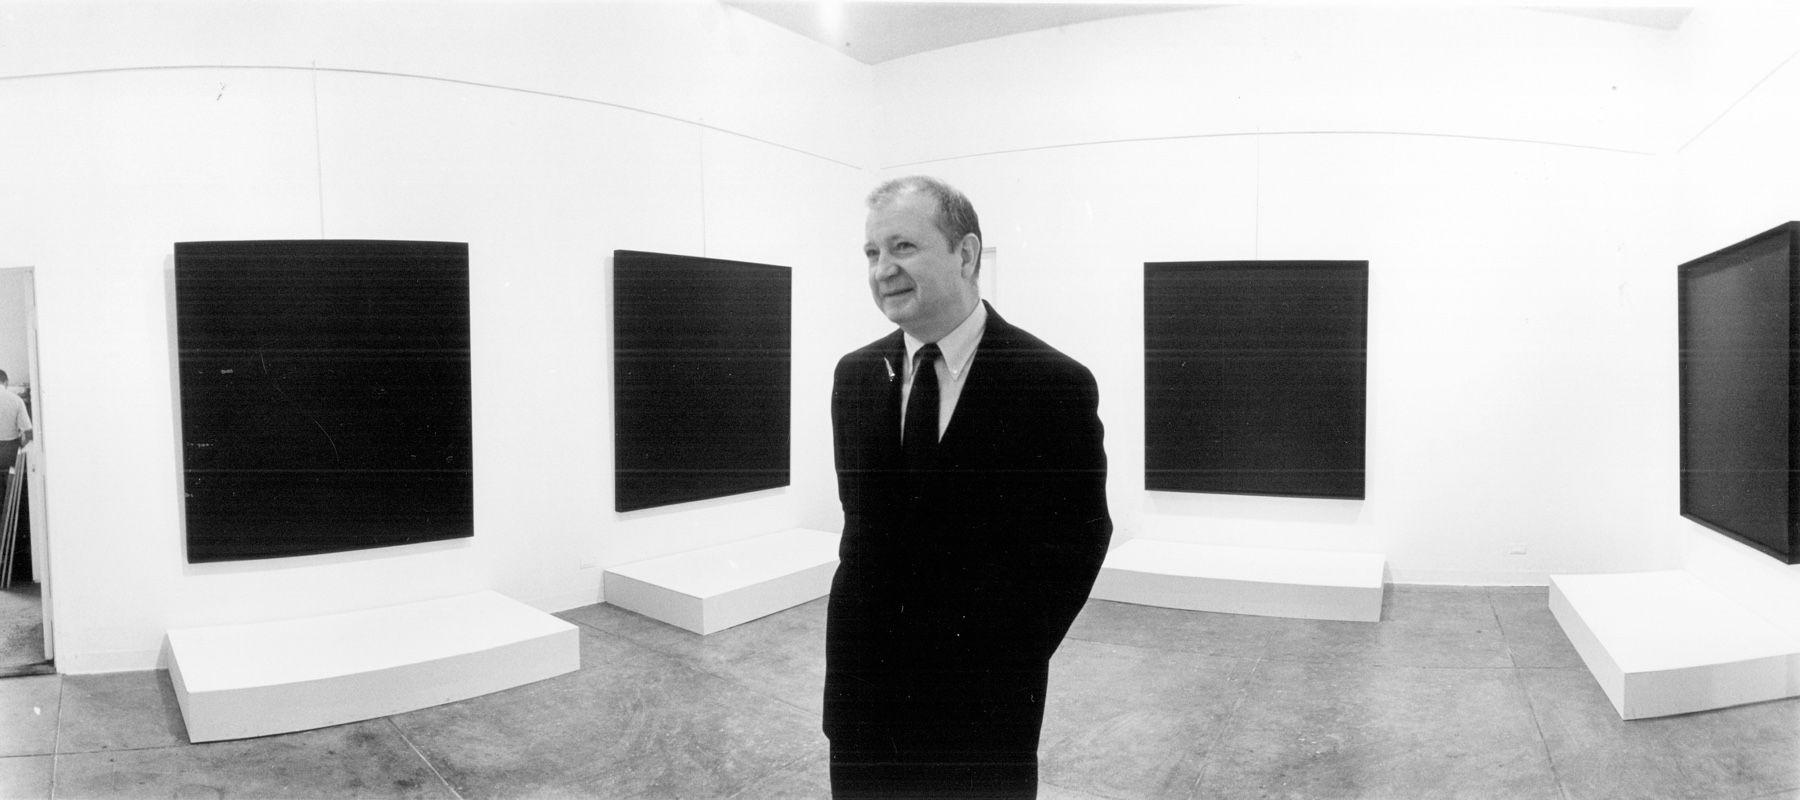 ad reinhardt museum of modern art